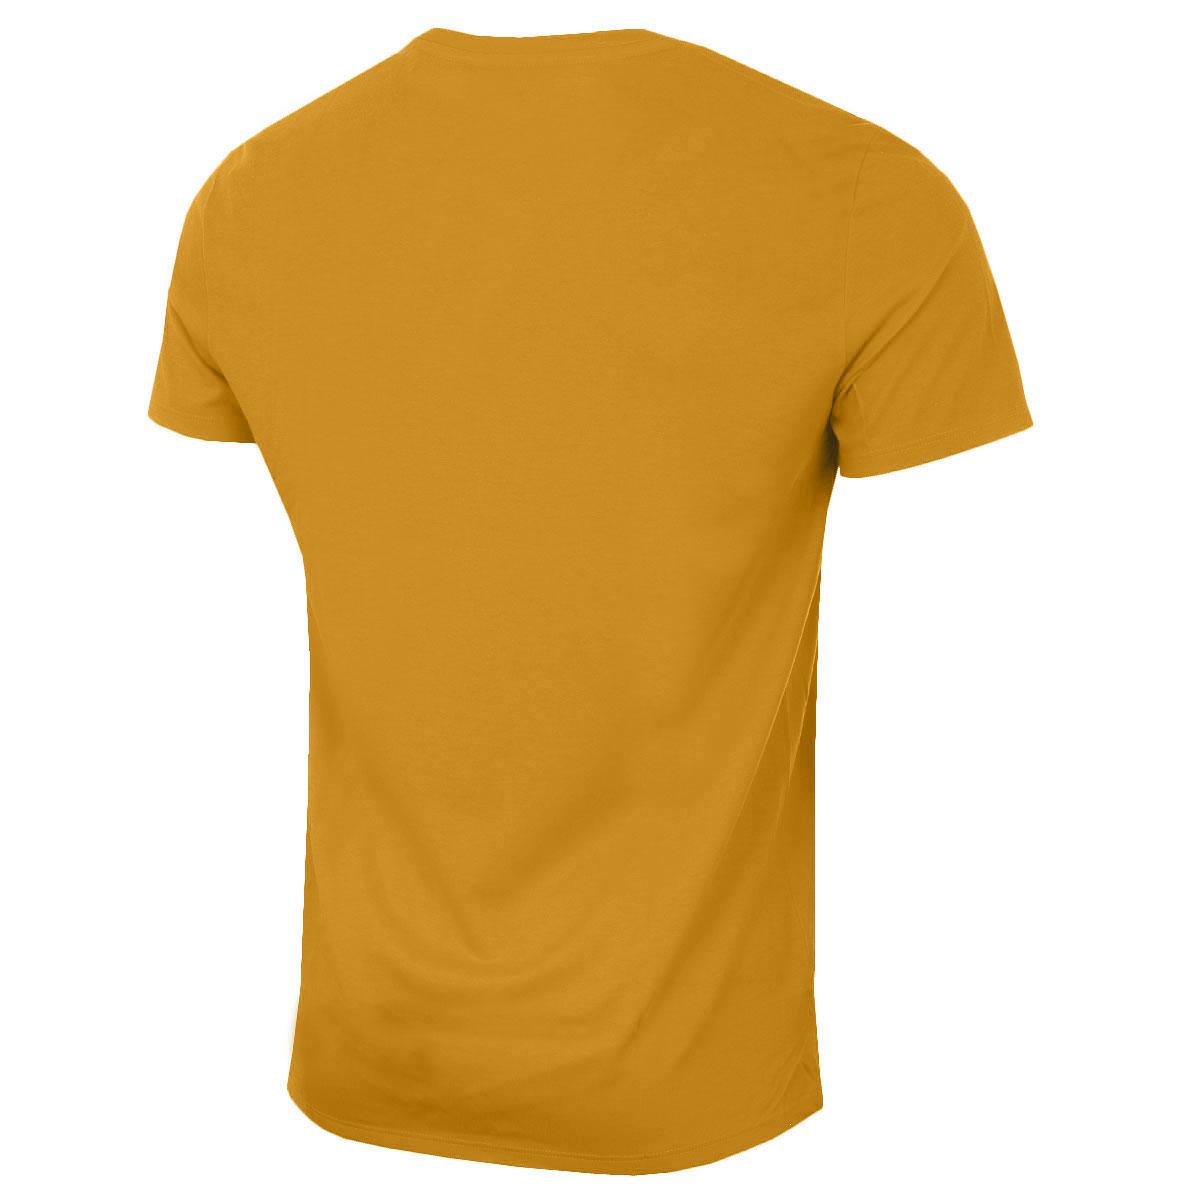 Lacoste-Mens-2019-SS-V-Neck-TH6710-Short-Sleeve-Pima-Cotton-Tee-T-Shirt thumbnail 10